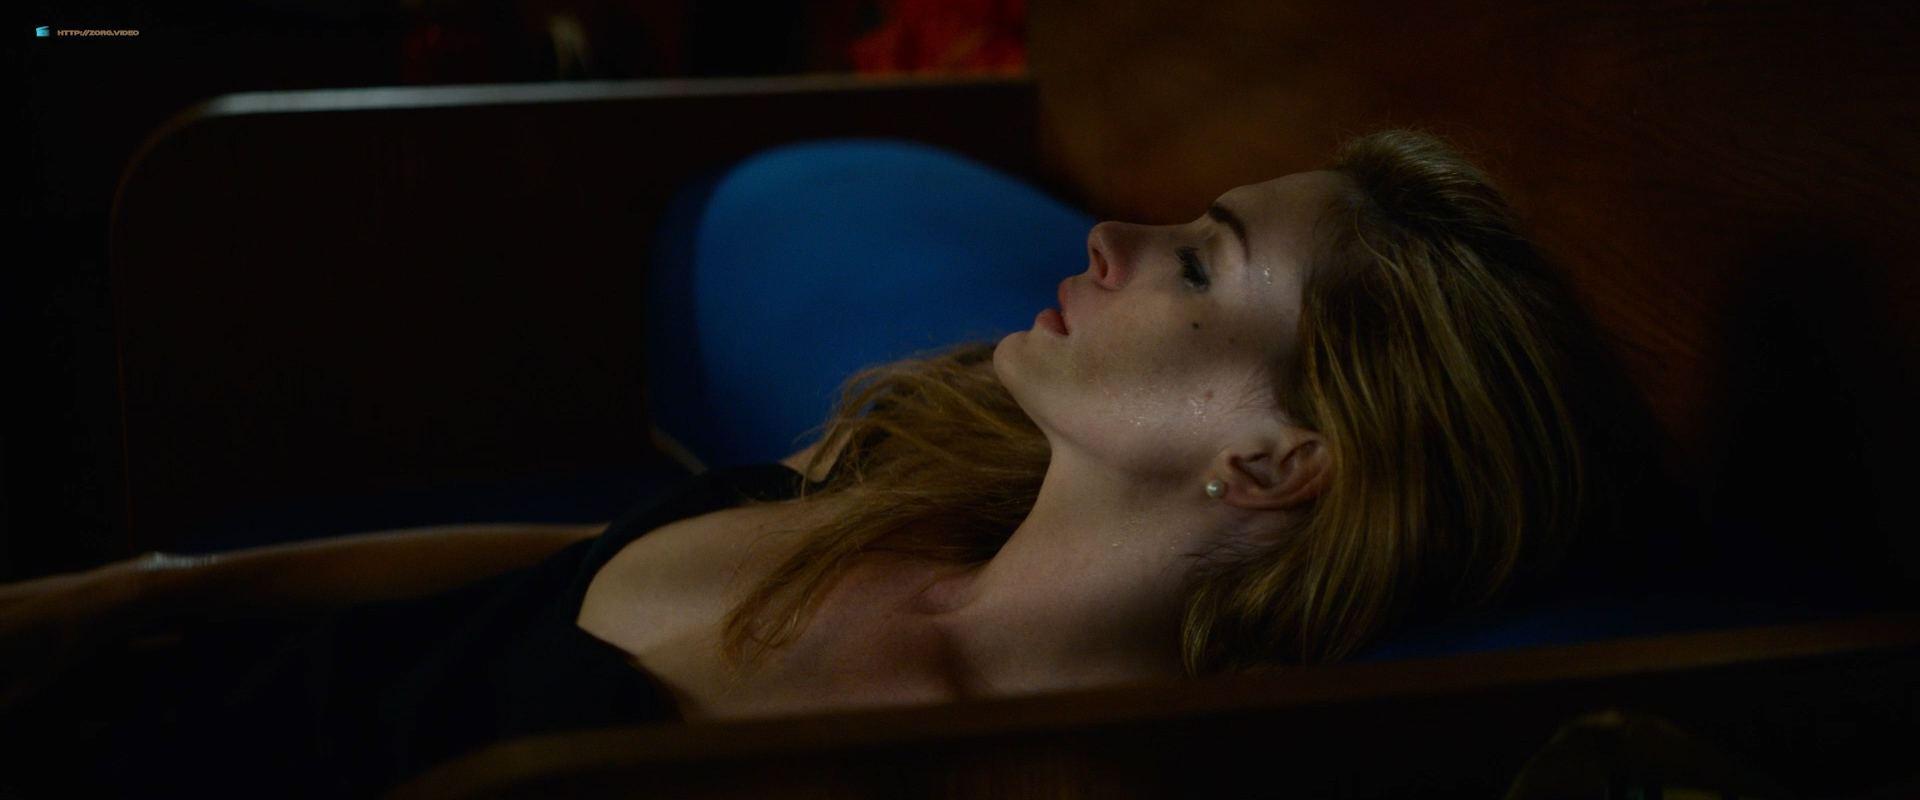 0201153347964_05_Anne-Hathaway-hot-in-sex-scene-Serenity-2019-HD-1080p-BluRay-00012.jpg